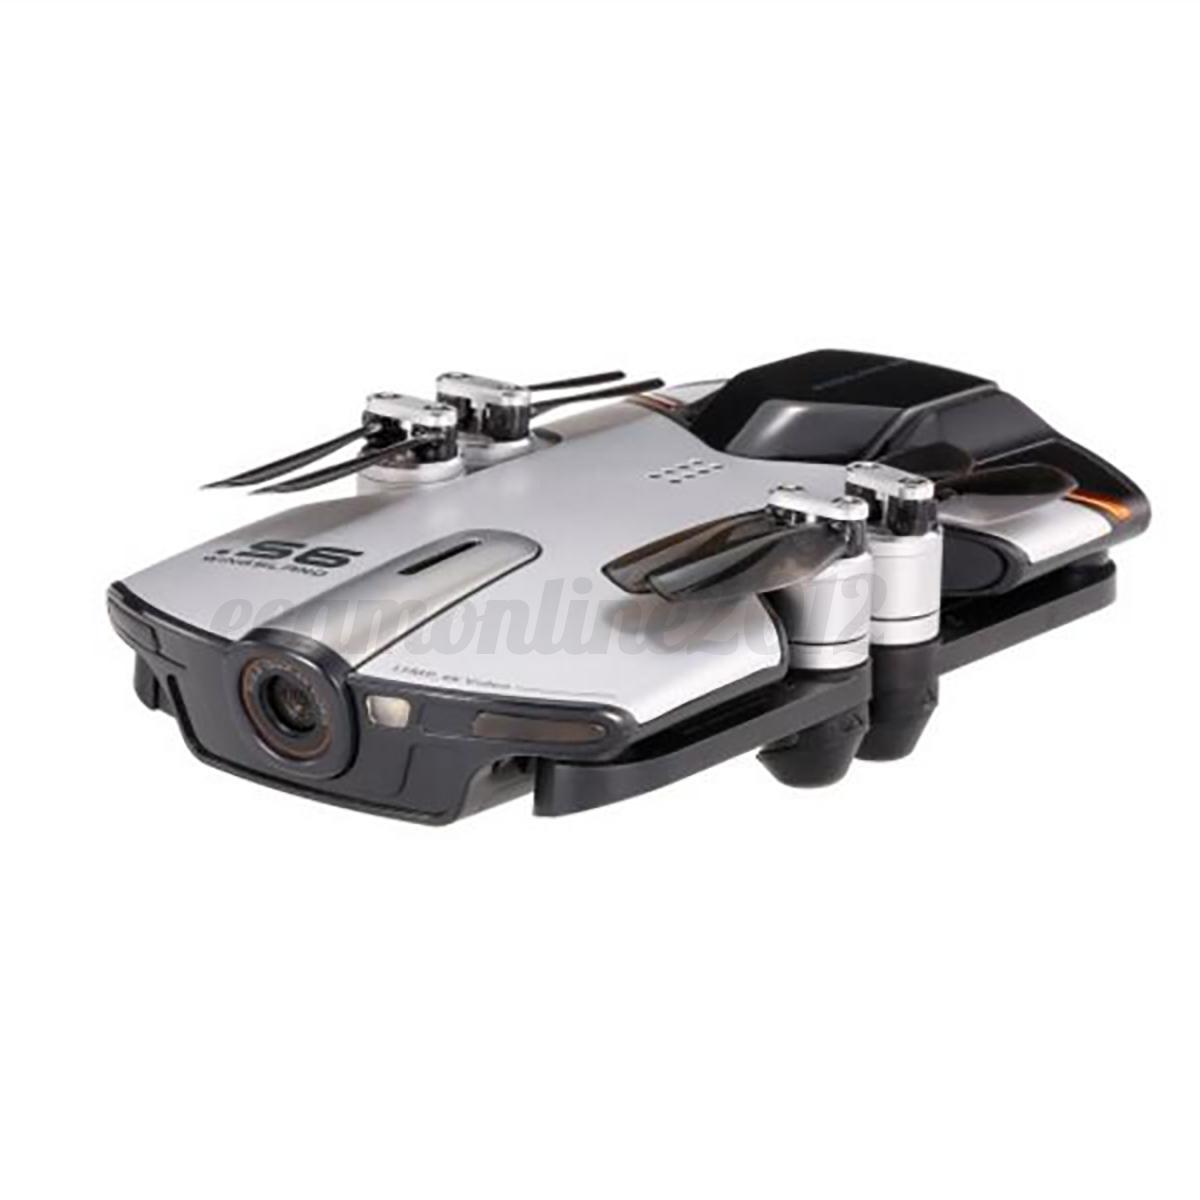 Wingsland-S6-Selfie-Drone-RC-GPS-WiFi-FPV-4K-UHD-13MP-Camara-Obstaculo-Evitacion